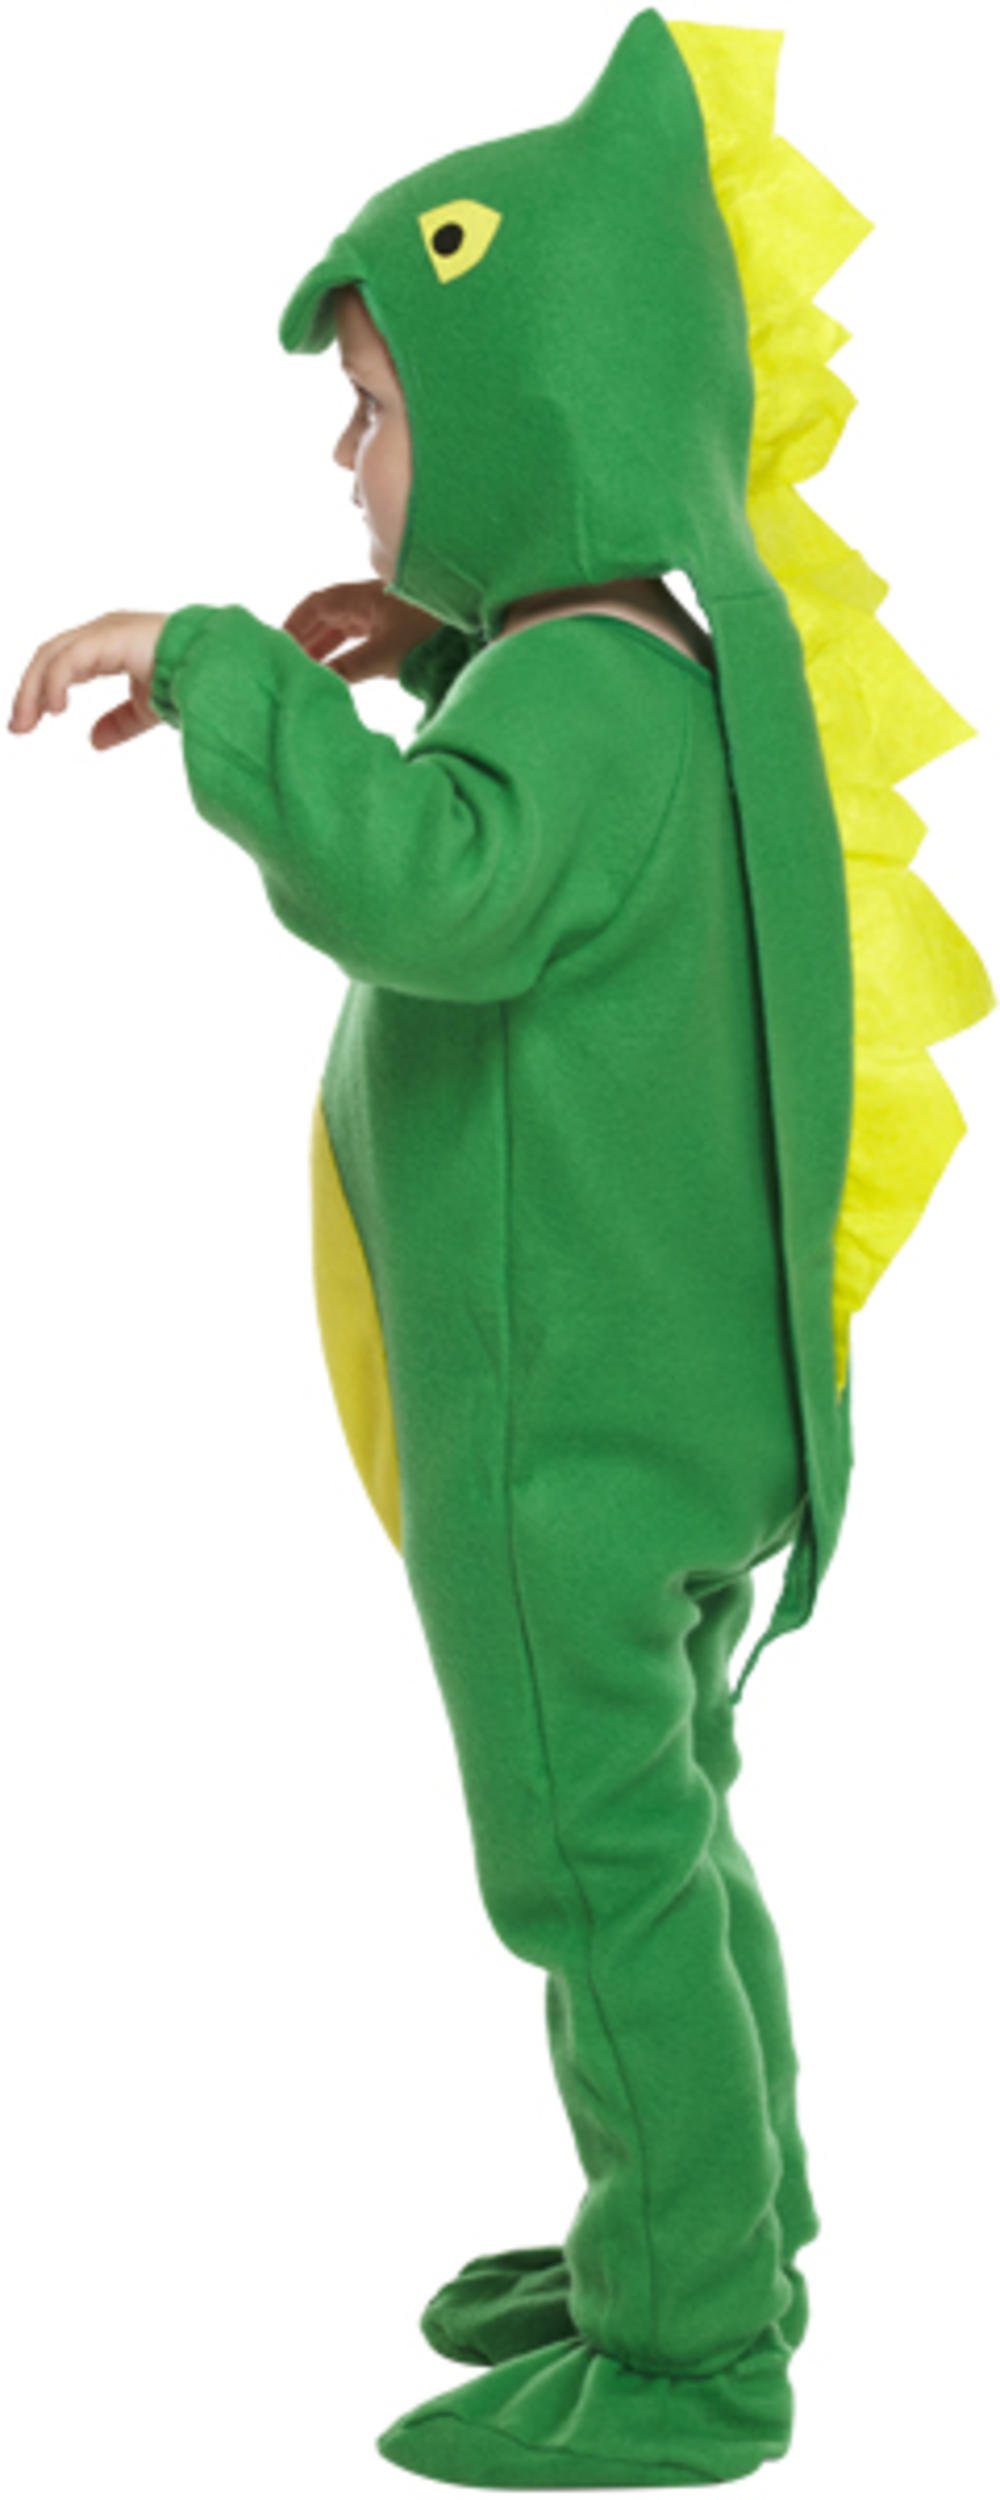 Kid's Toddler Size Dinosaur Costume